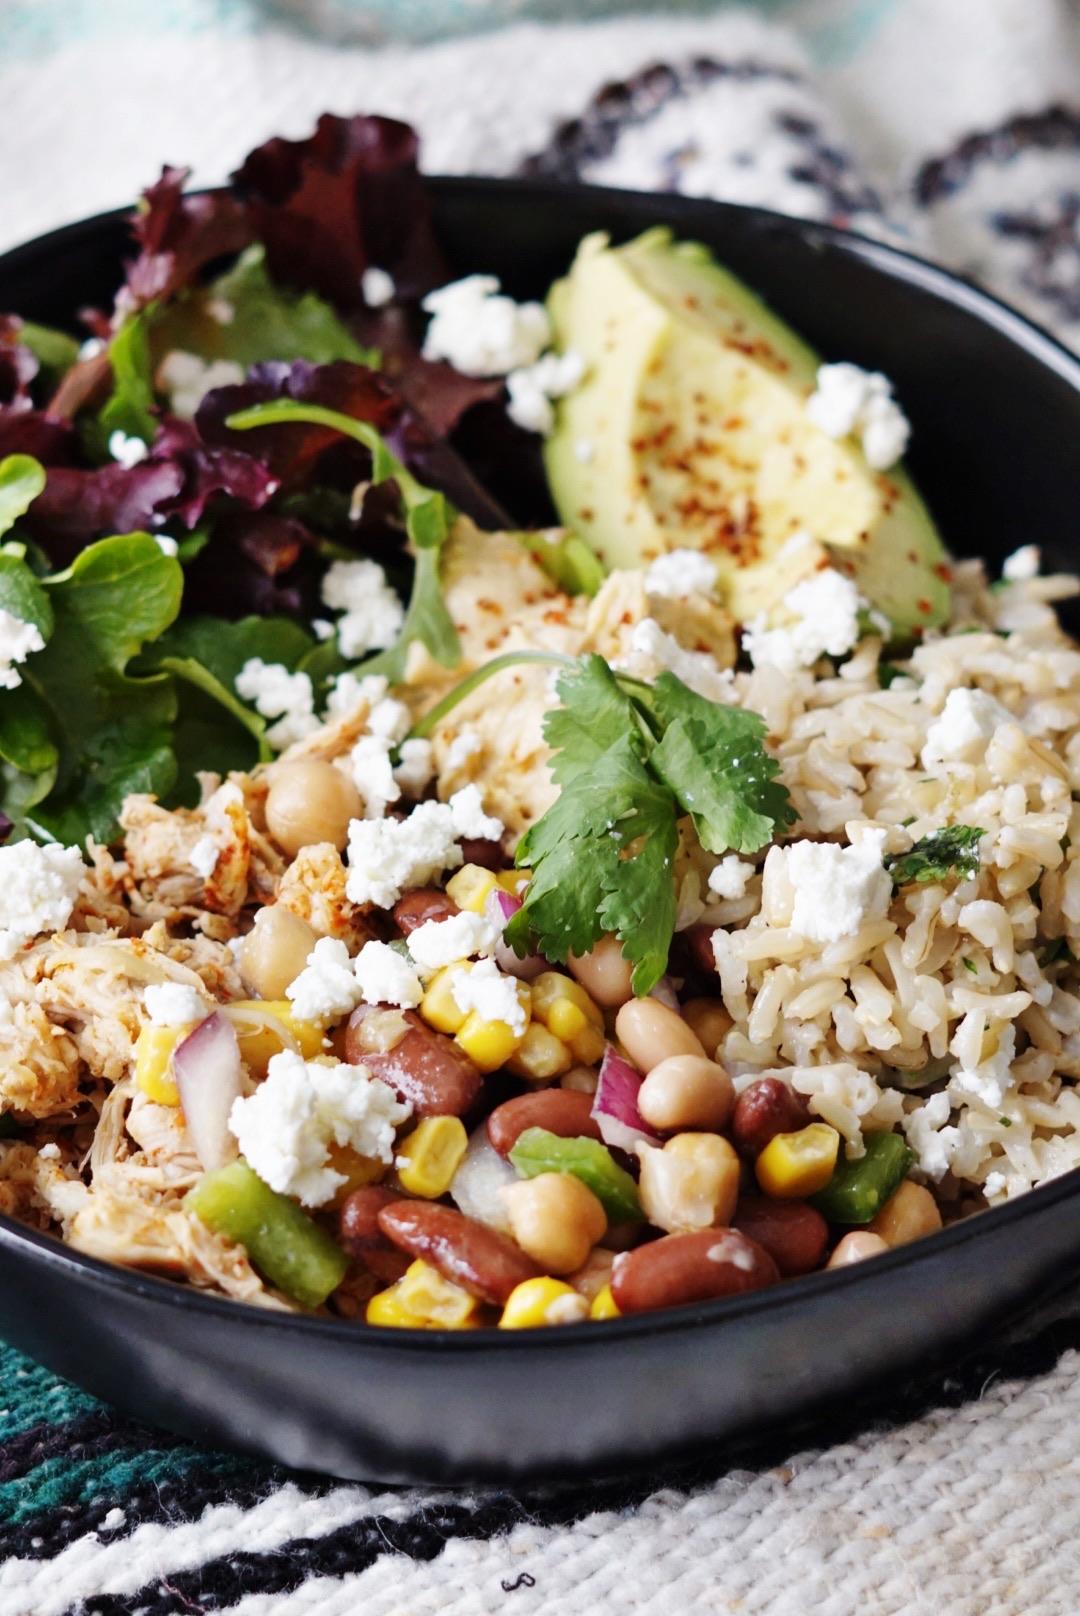 Taco Bowl With 3 Bean Salad | Mackenzie's Table